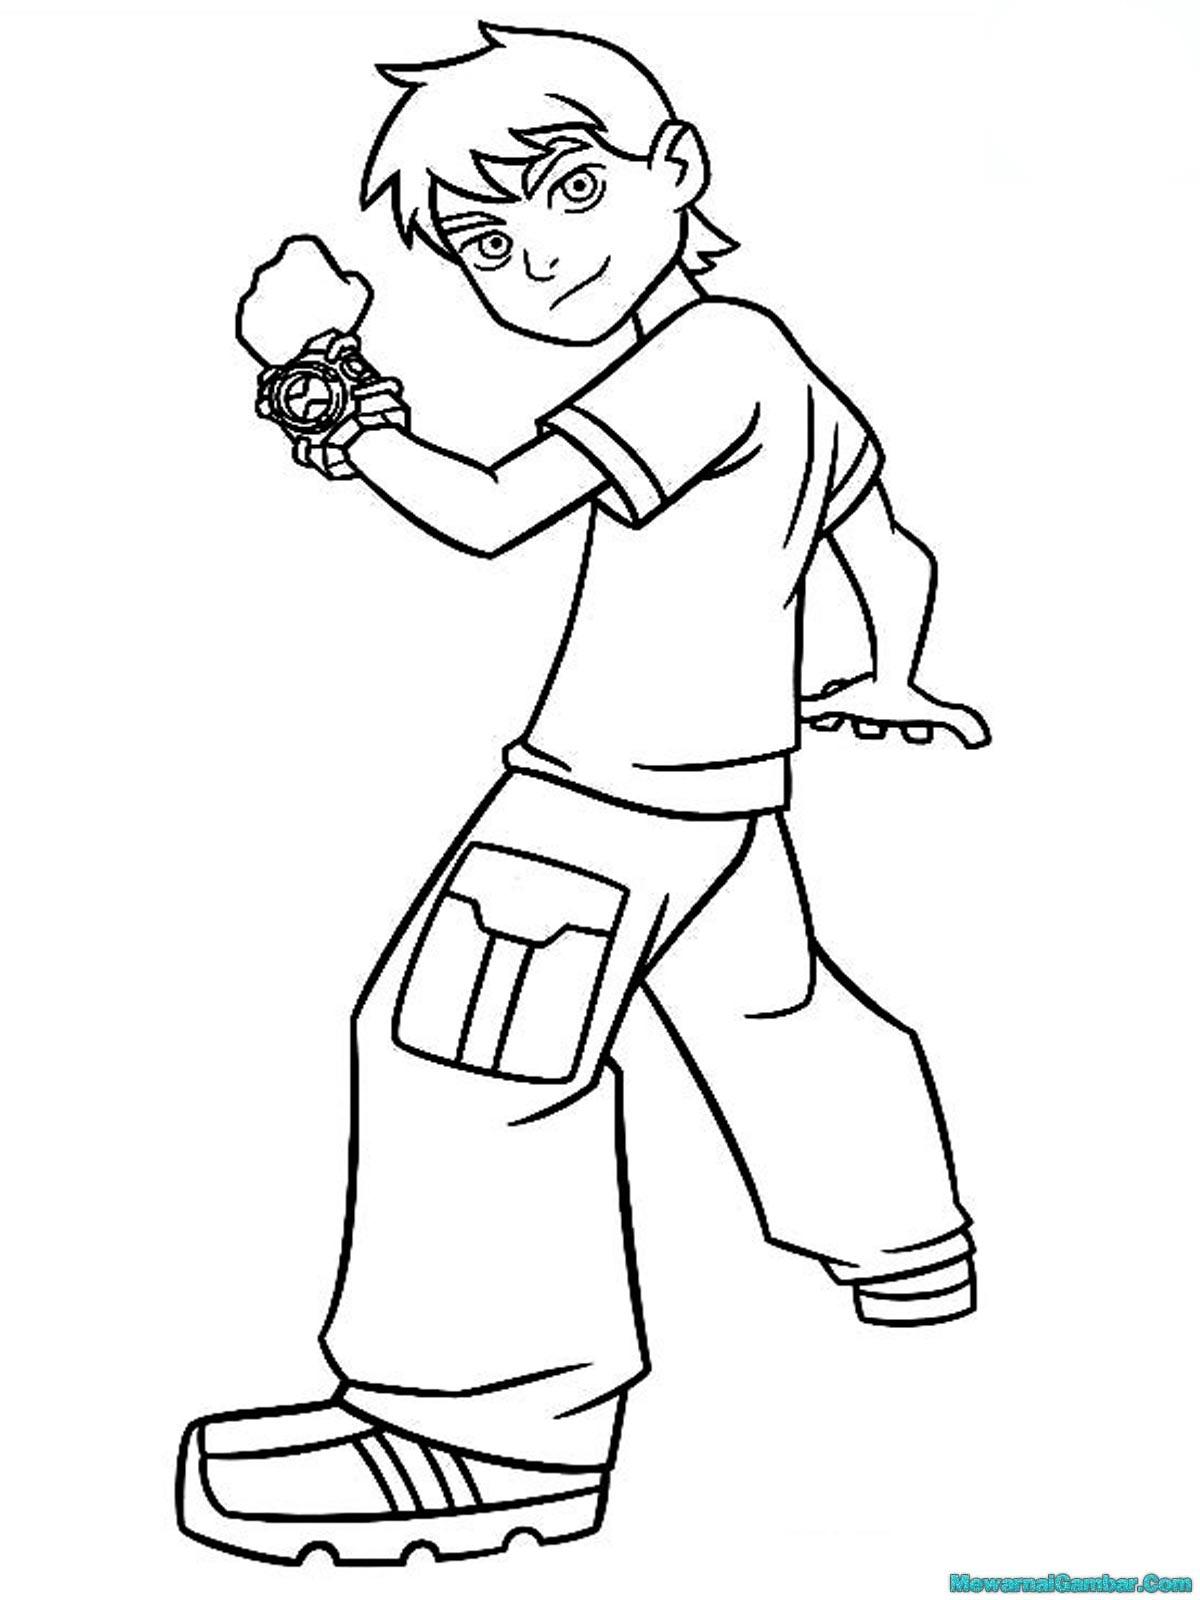 Download Buku Mewarnai Gambar Kartun Mewarnai Gambar | Review Ebooks